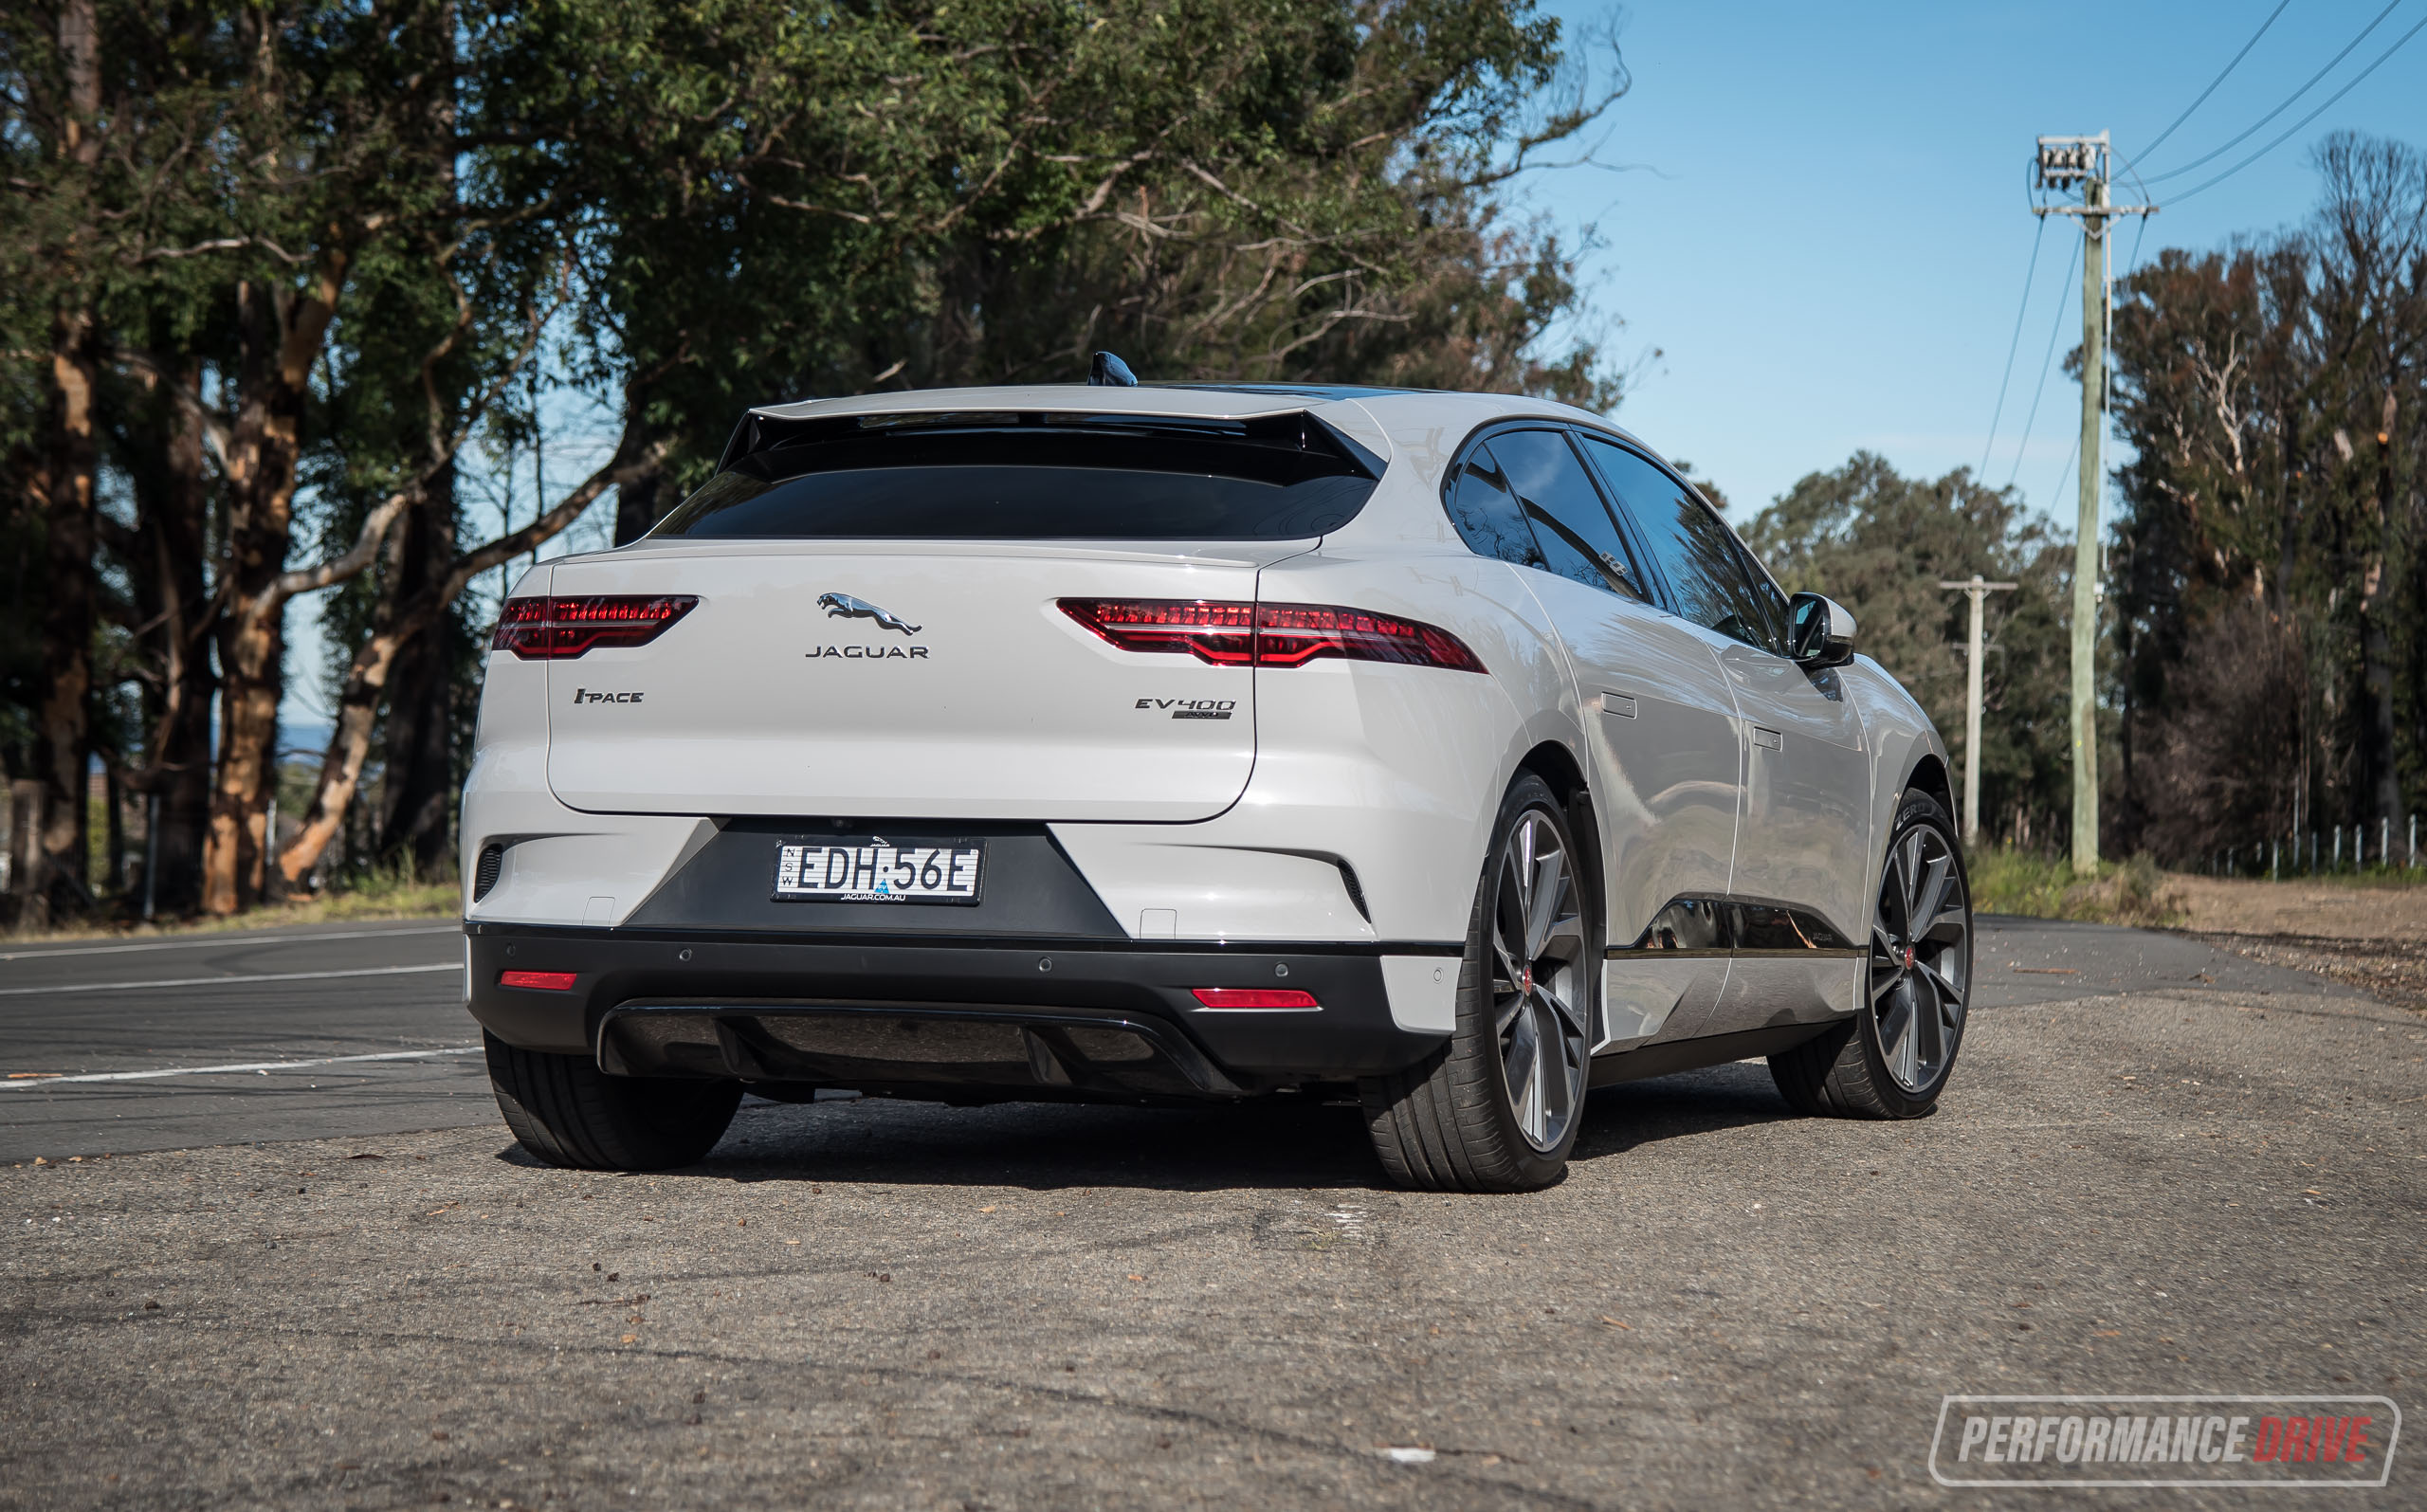 2020 Jaguar I-PACE SE review (video) | PerformanceDrive